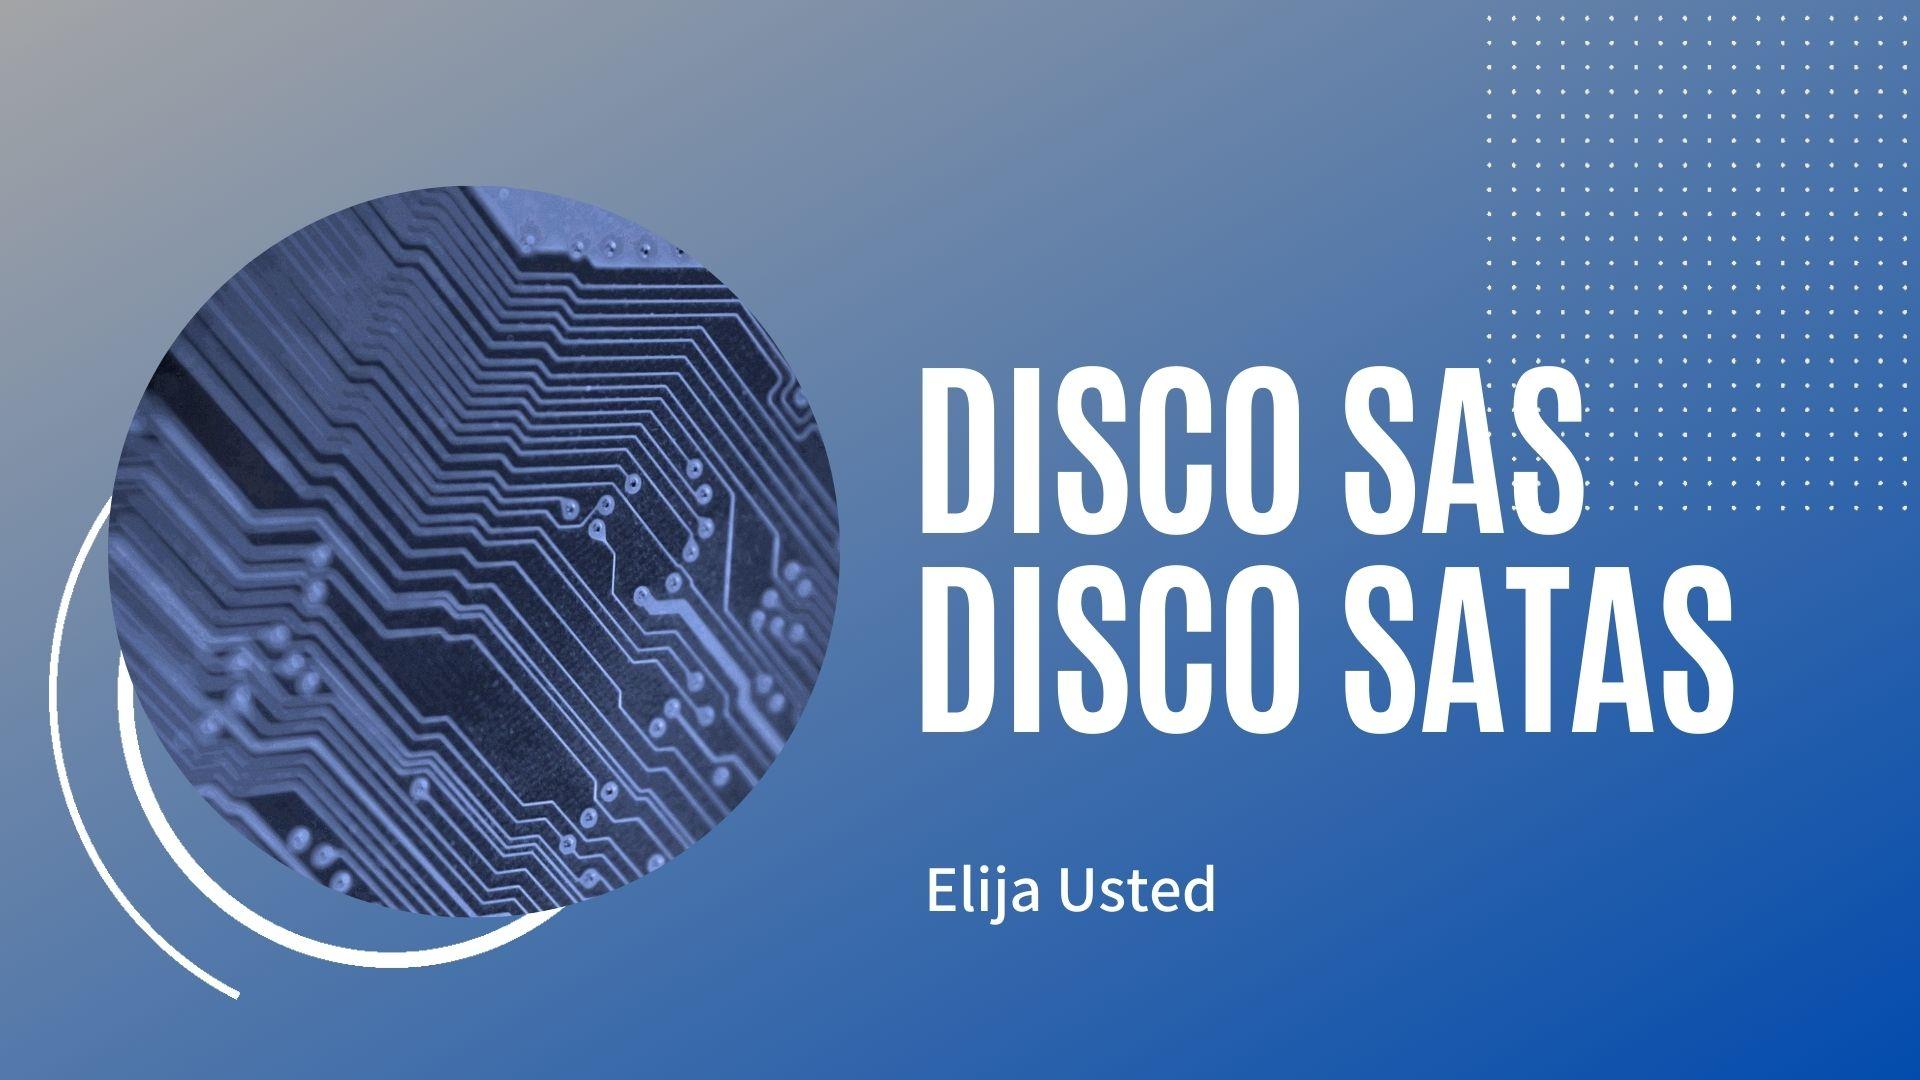 Discos SAS o discos SATA. ¡Elija usted!